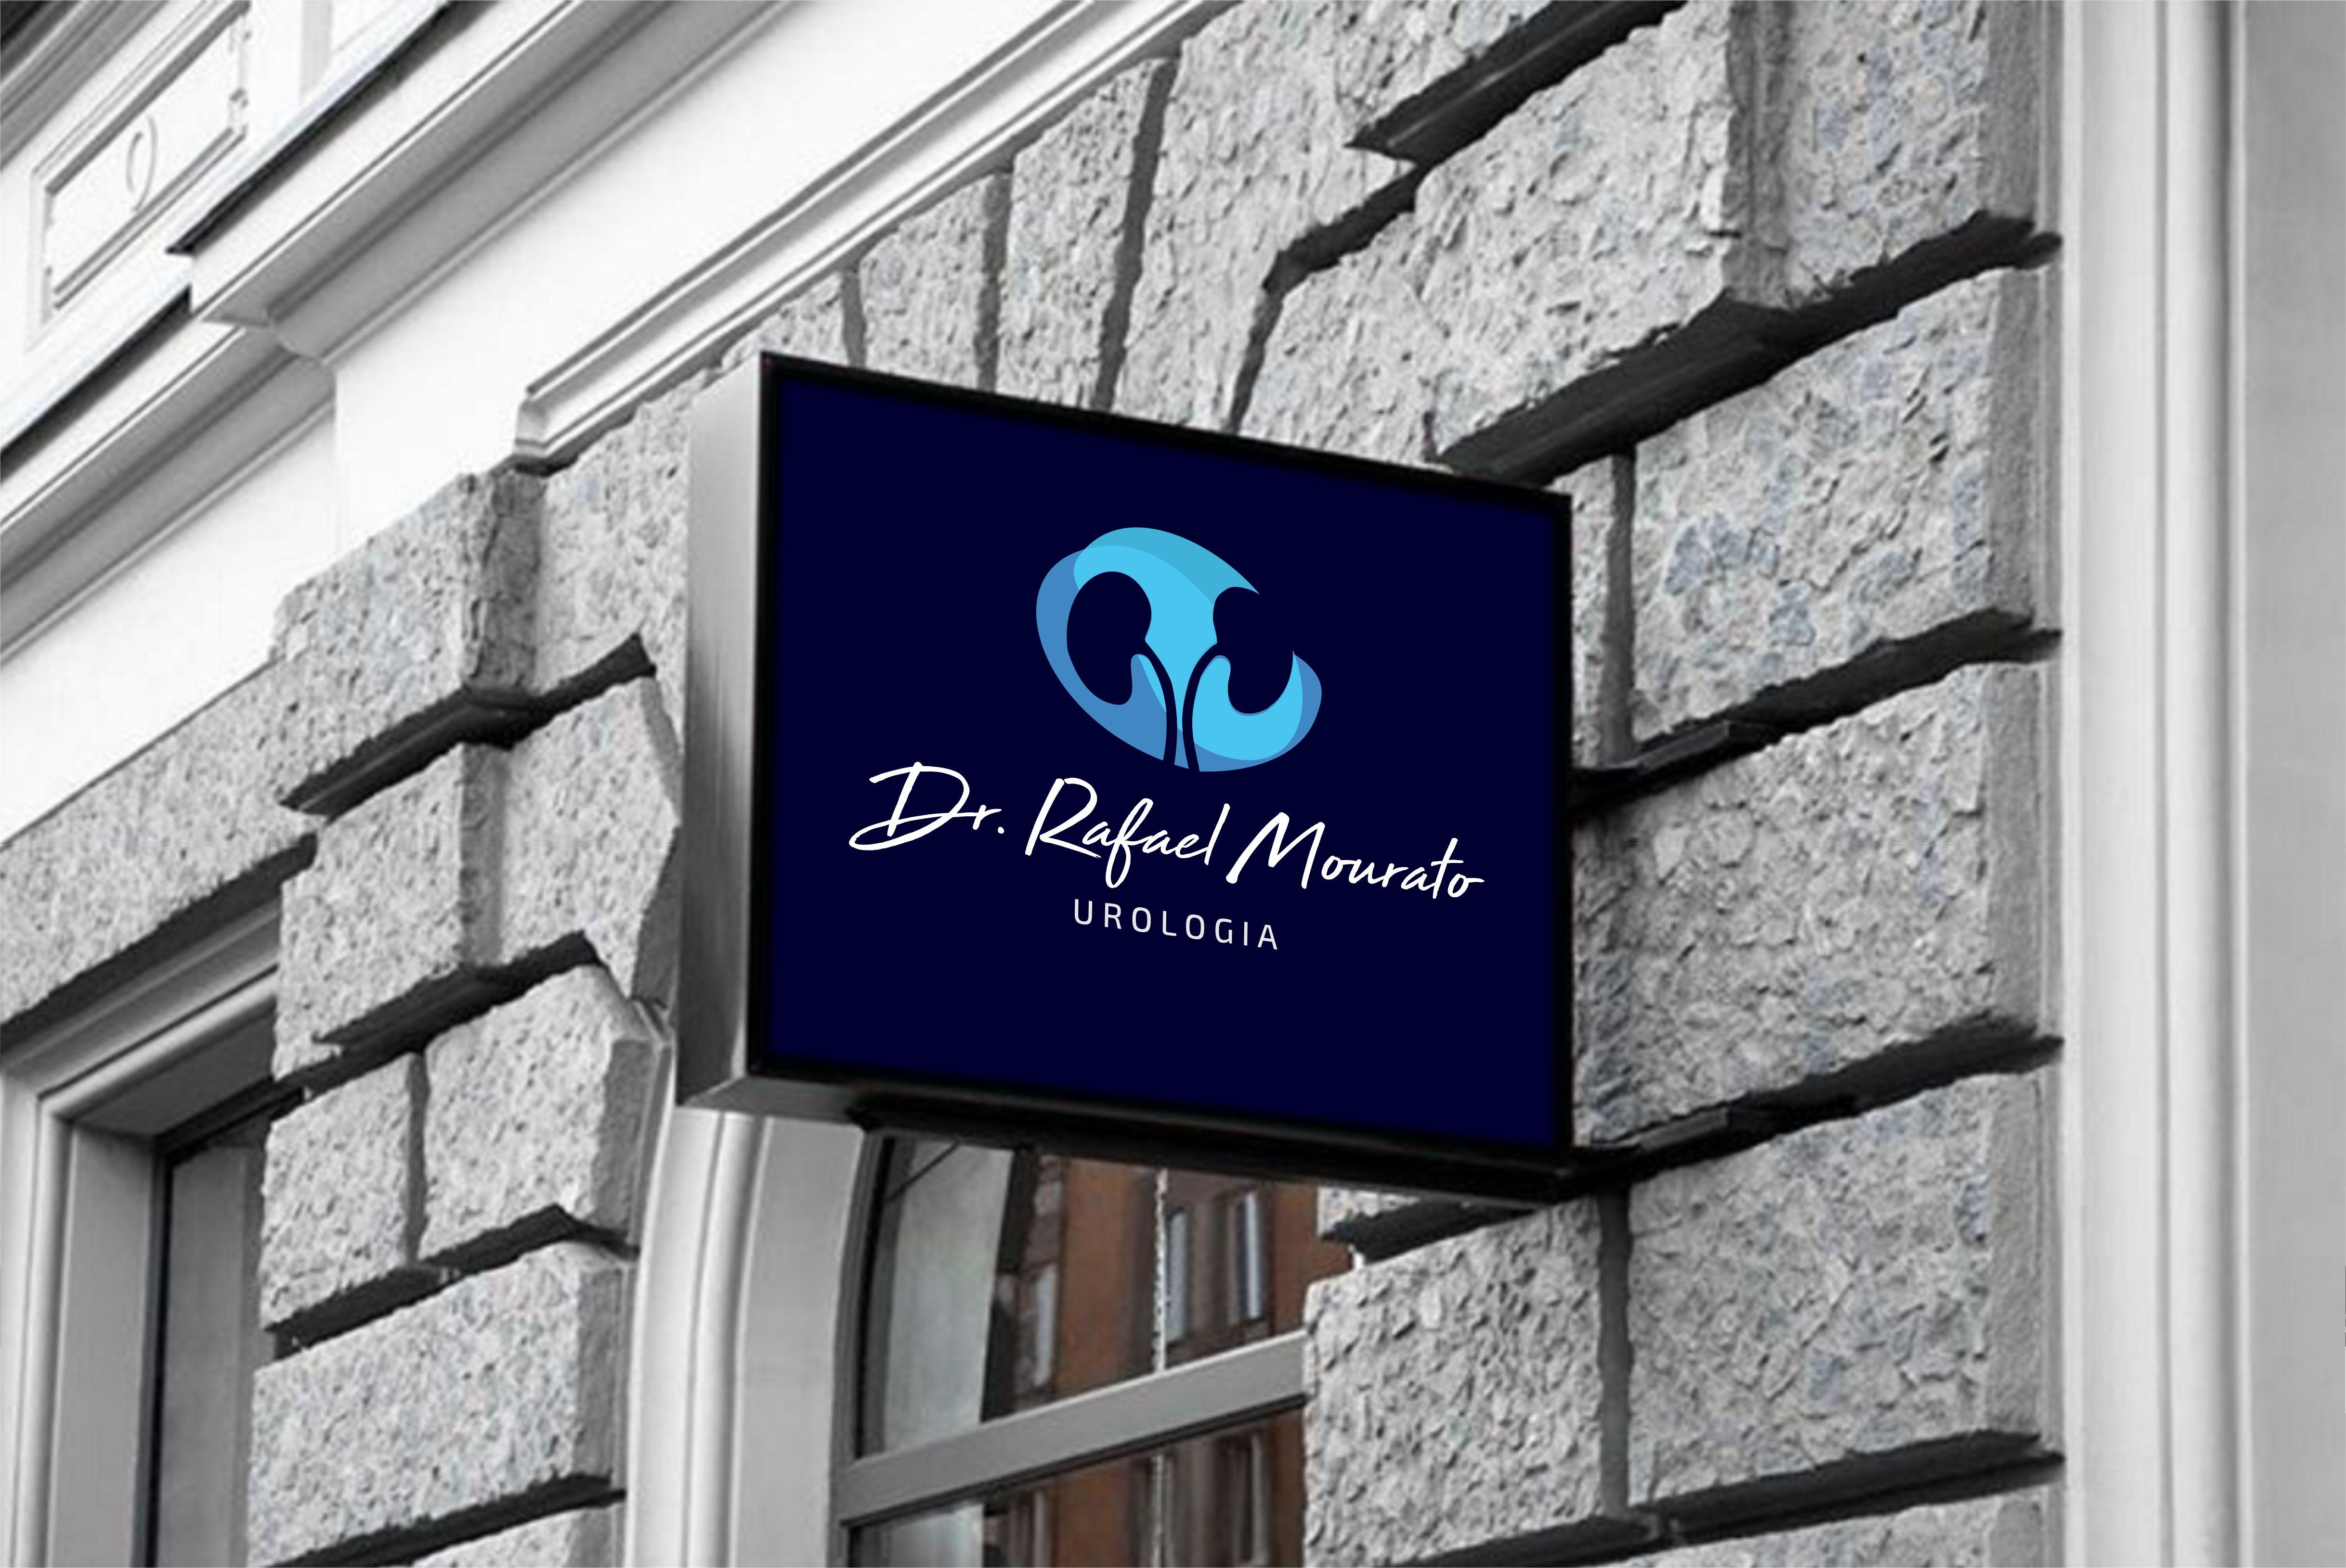 DR. RAFAEL MOURATO